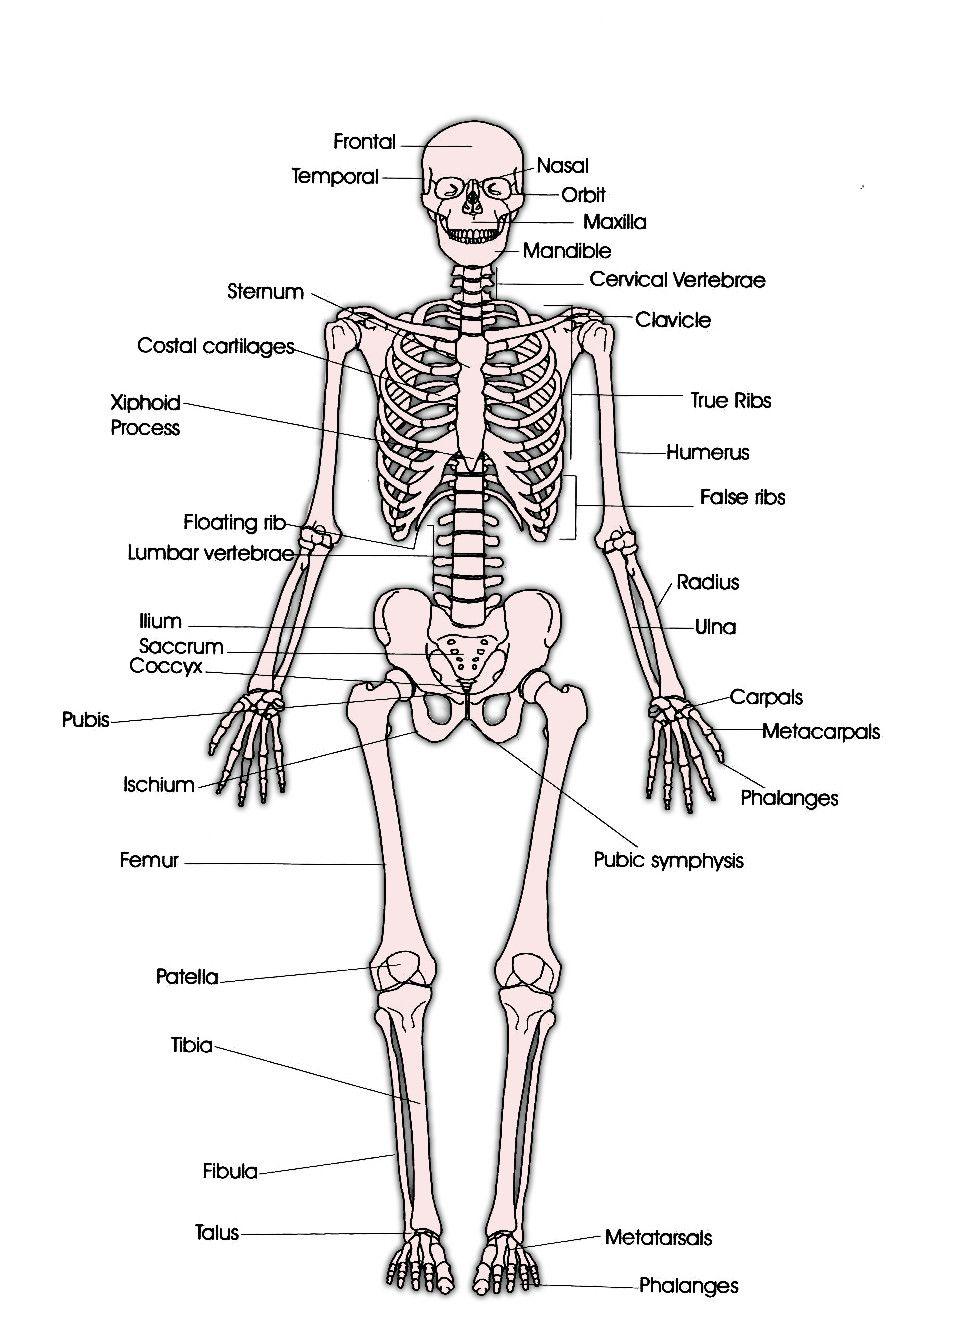 Simple Skeleton Diagram To Label Awesome Faith Raspberry Skeleton Skeletal System Skeletal System Worksheet Human Skeletal System